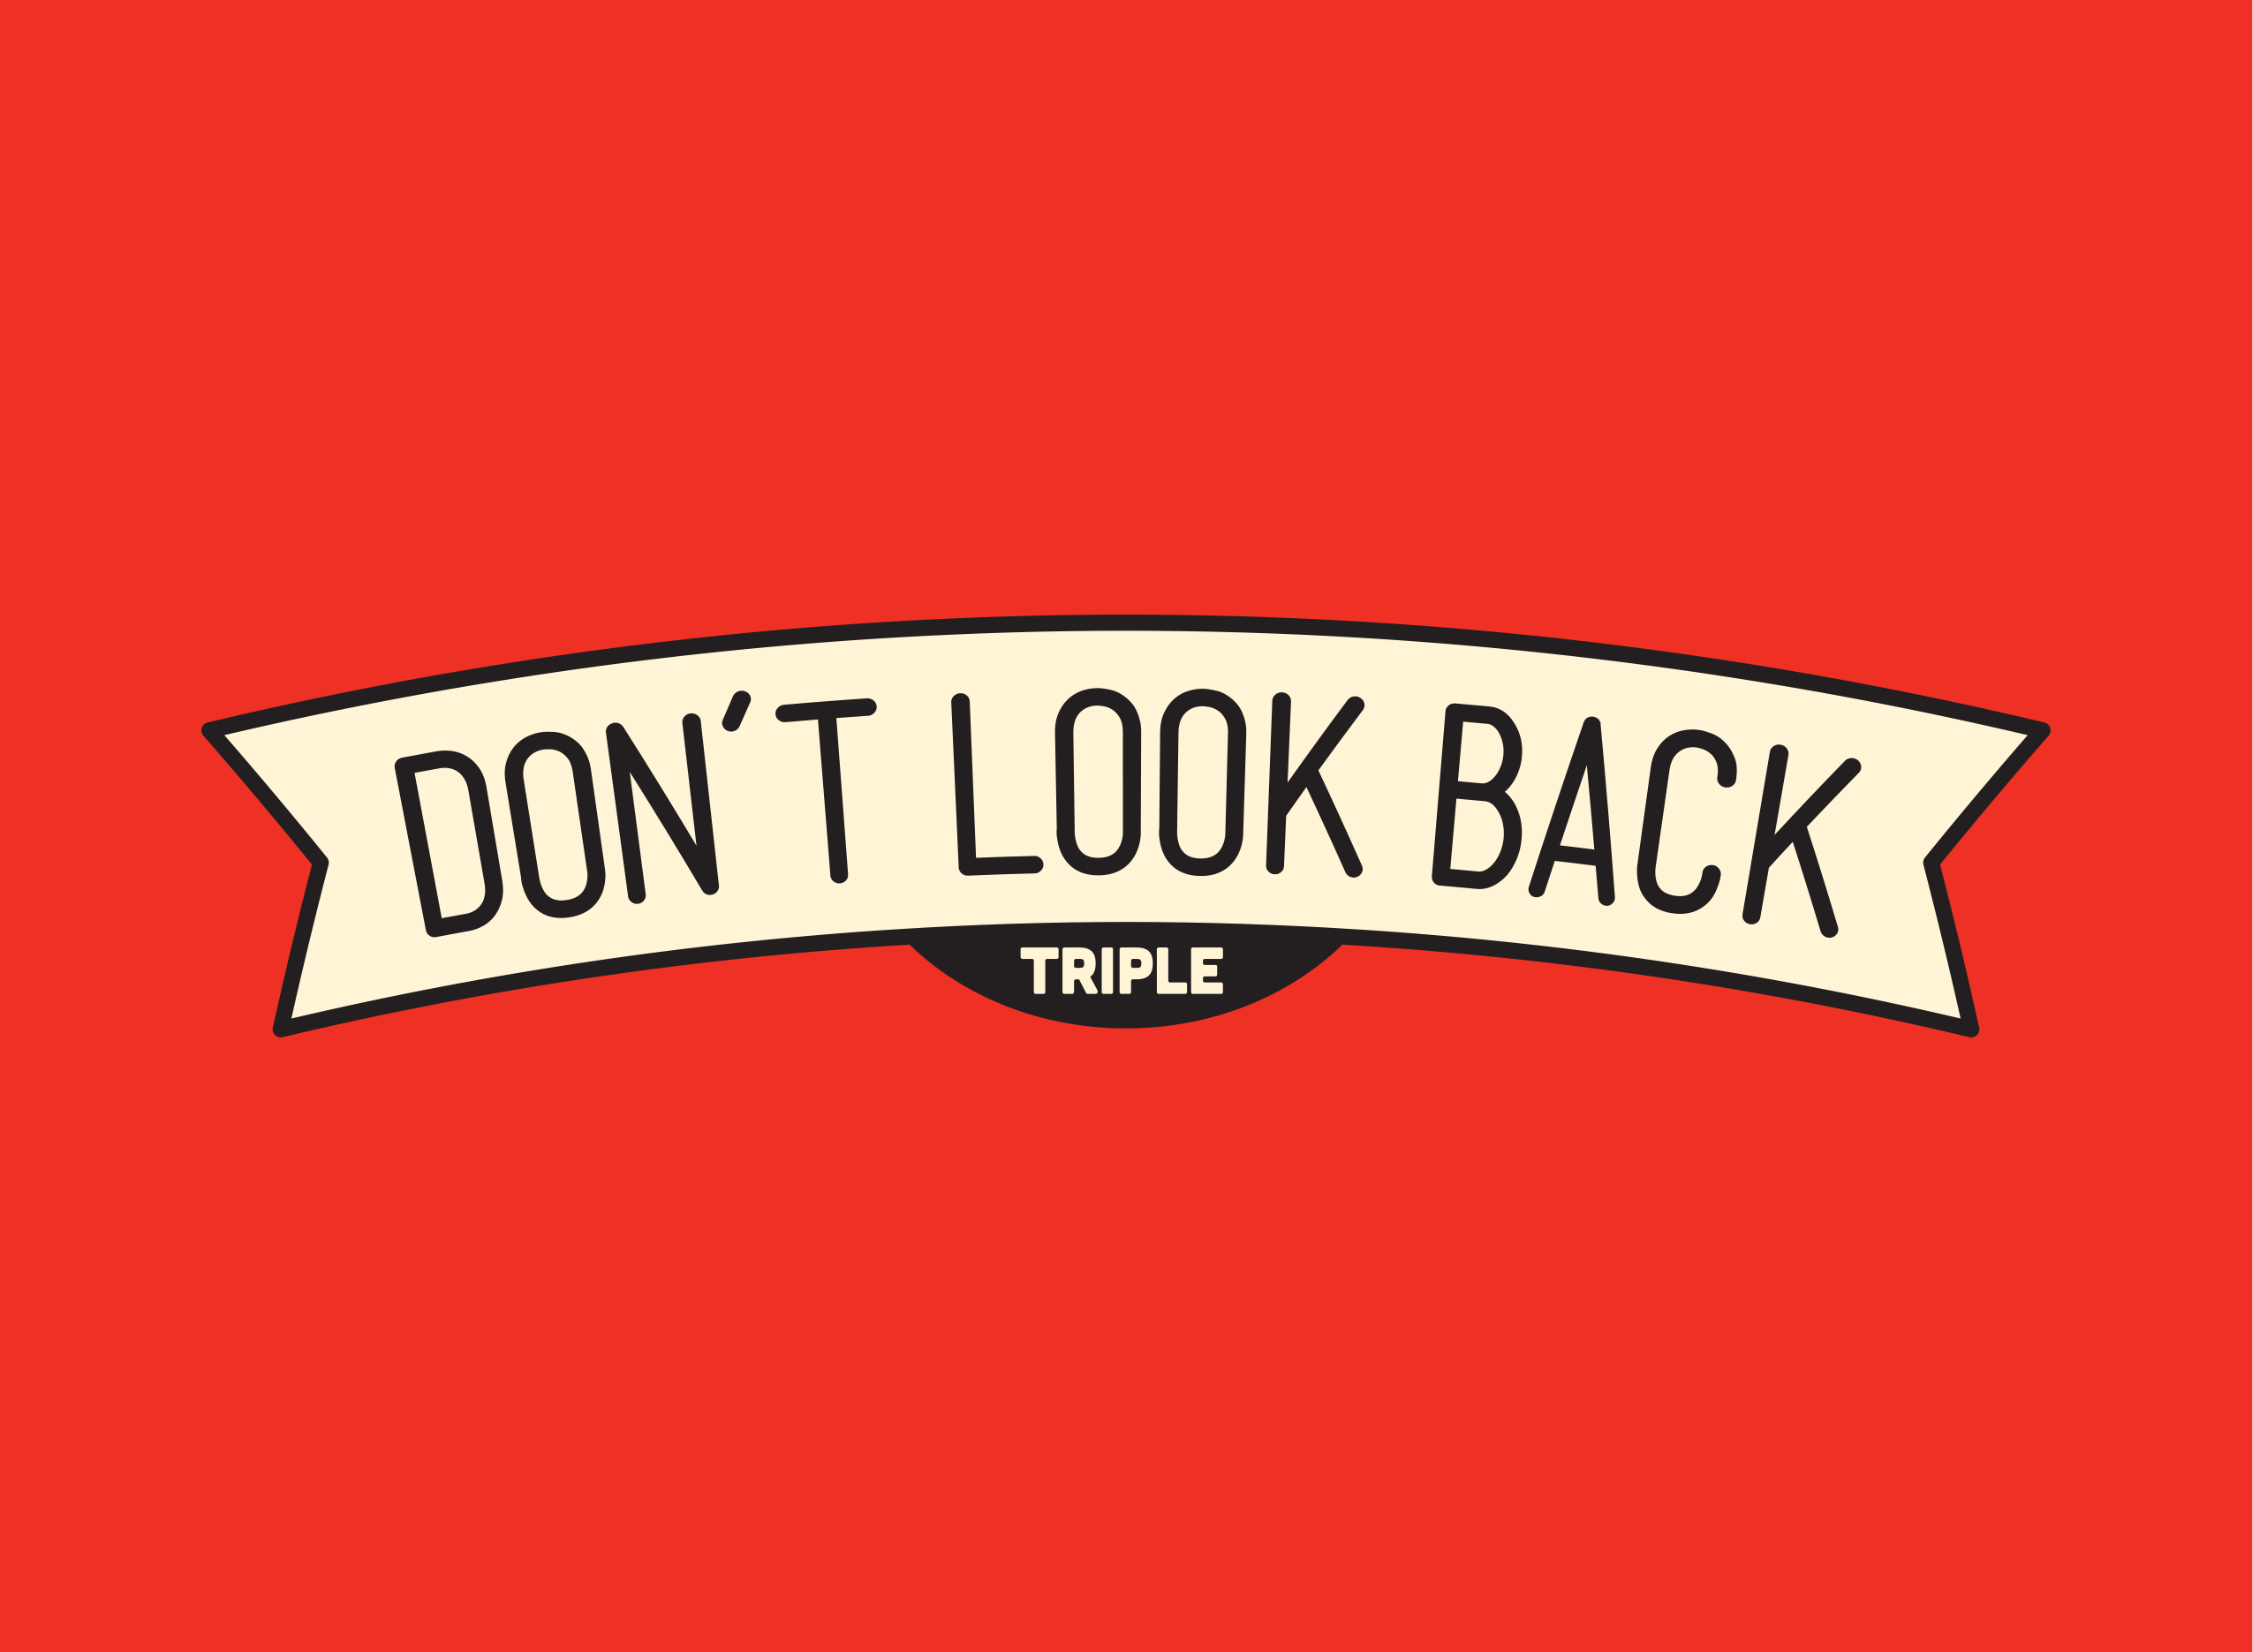 Don't Look Back - Triple